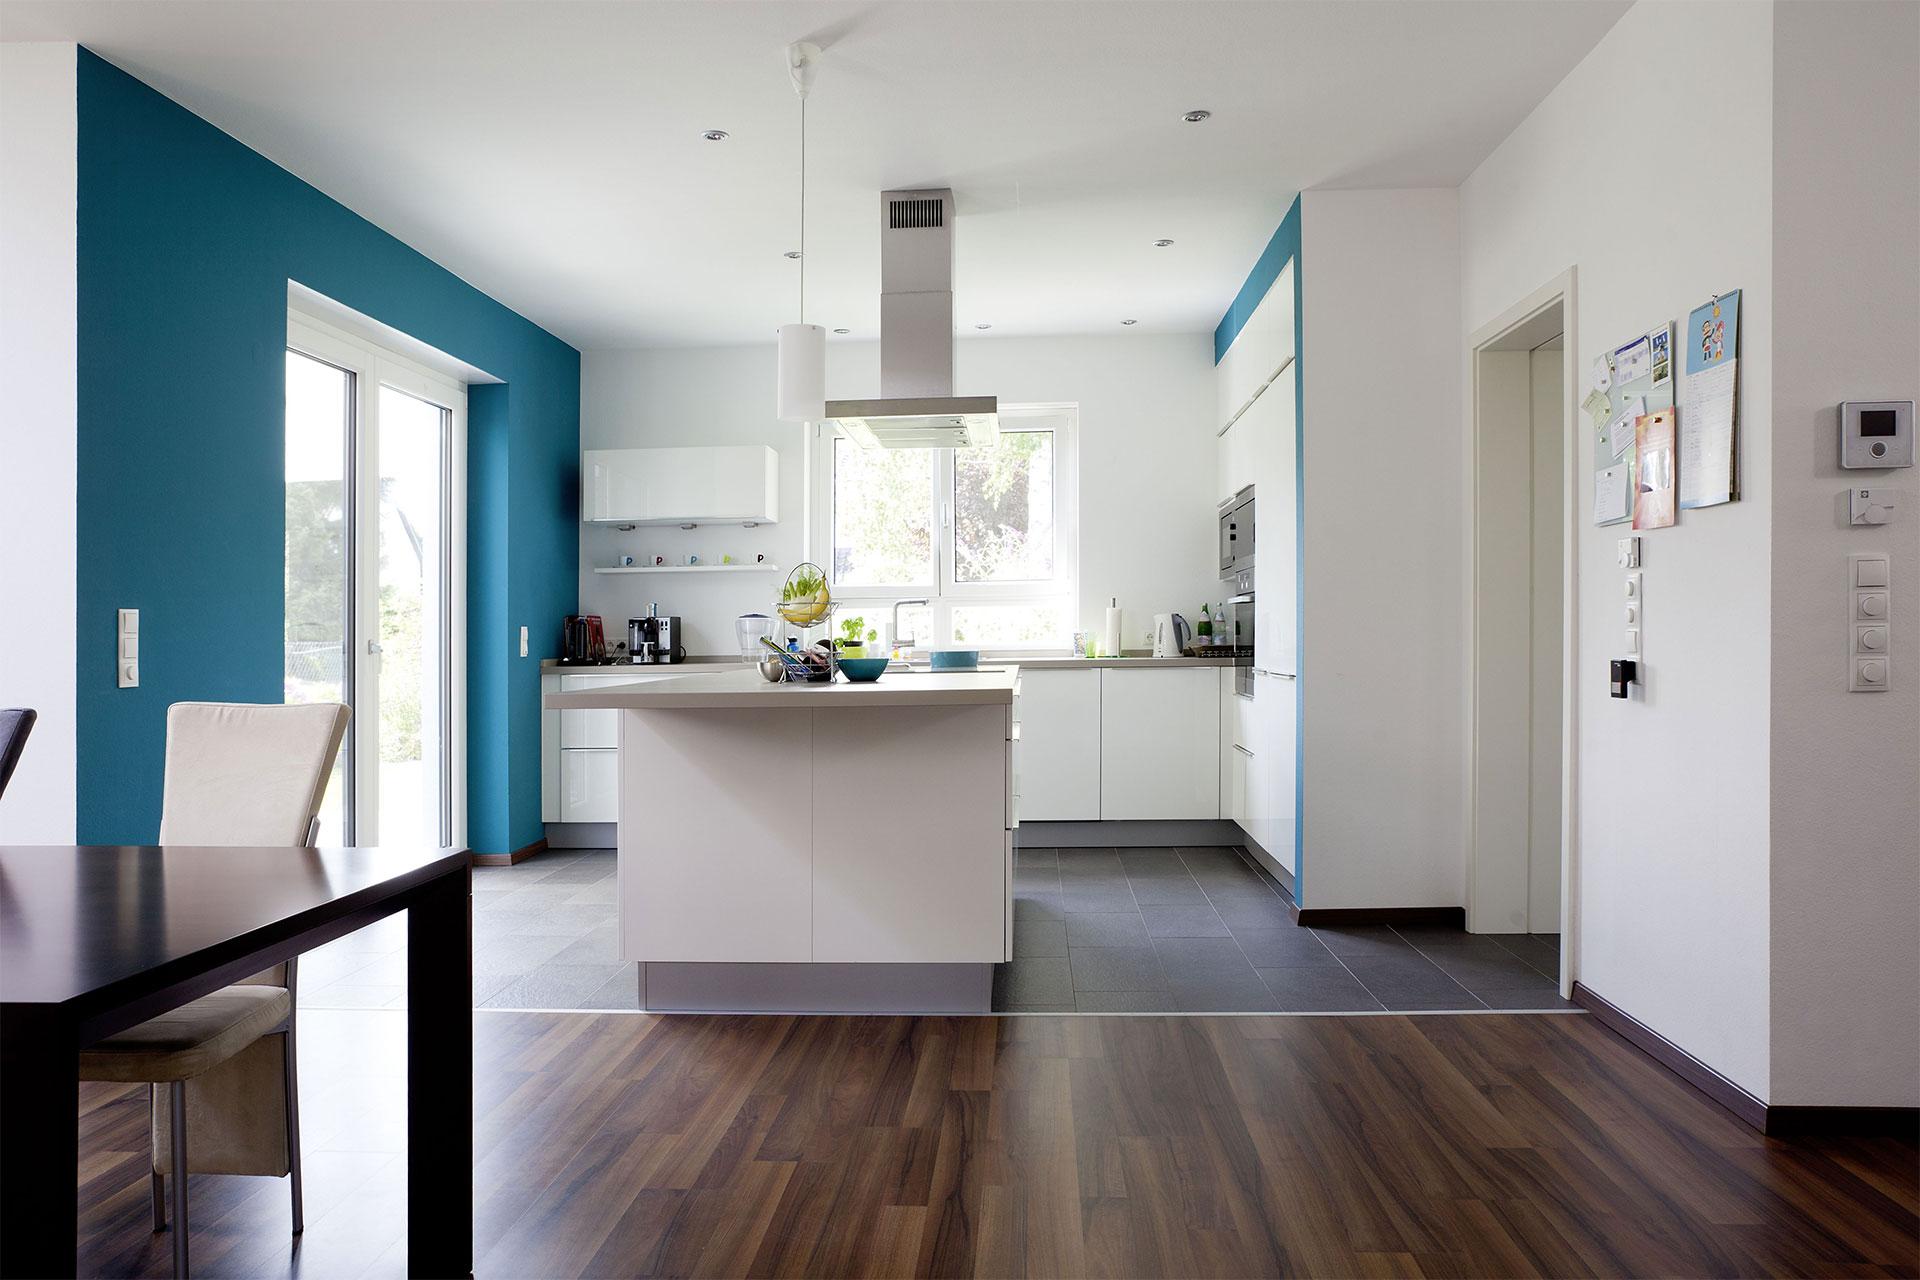 fertighaus flachdach modell castello ein fertighaus. Black Bedroom Furniture Sets. Home Design Ideas